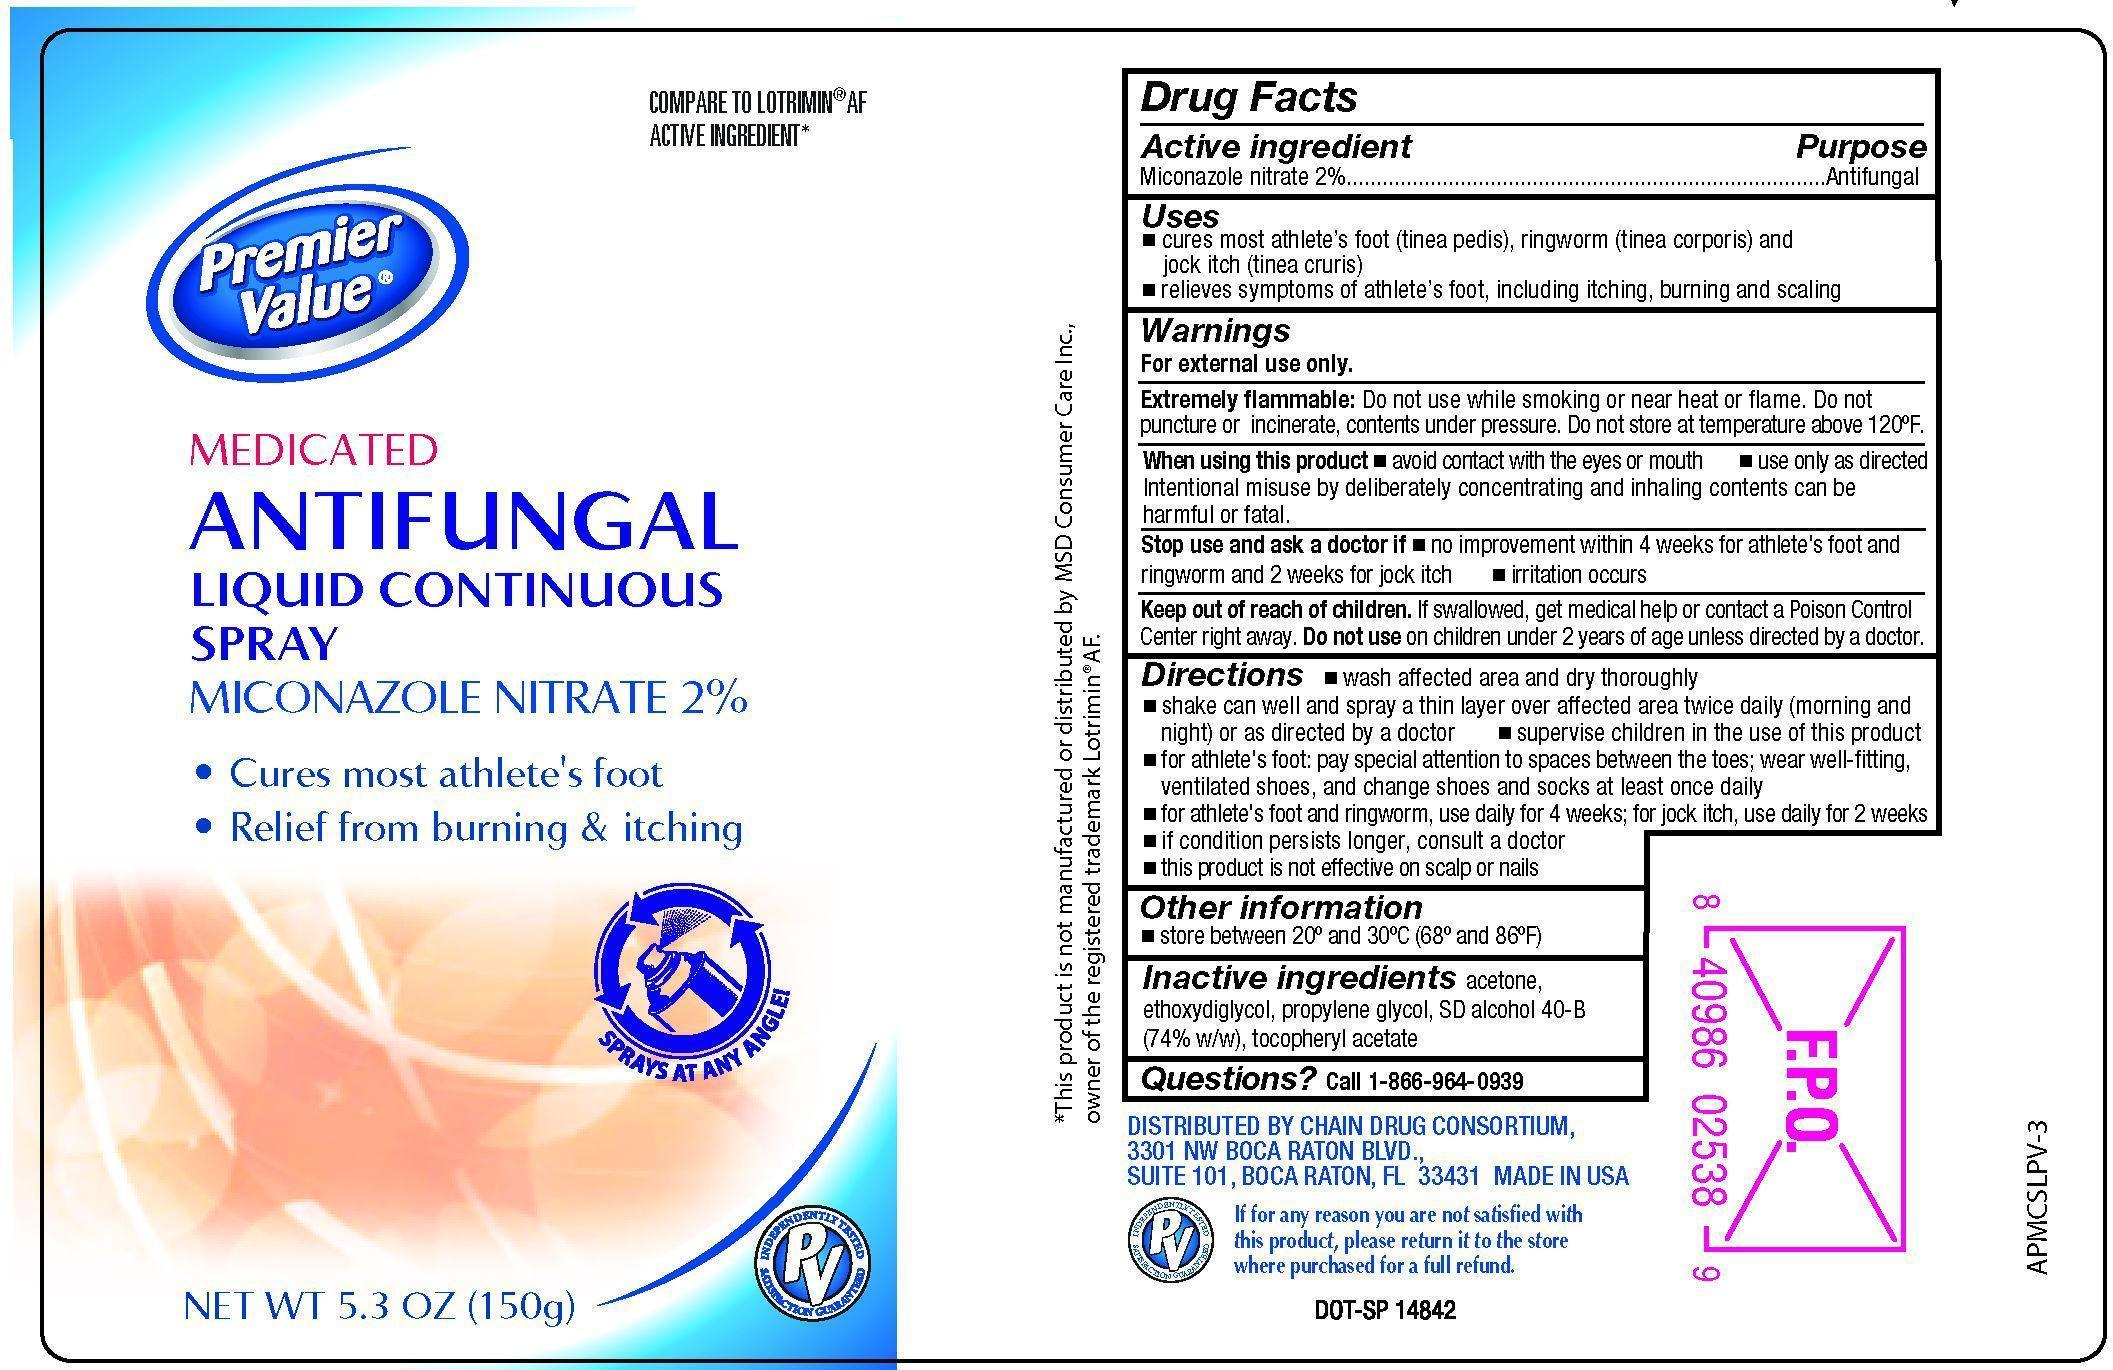 PV Antifngl Mic Nitrate LiqSpry-3.jpg